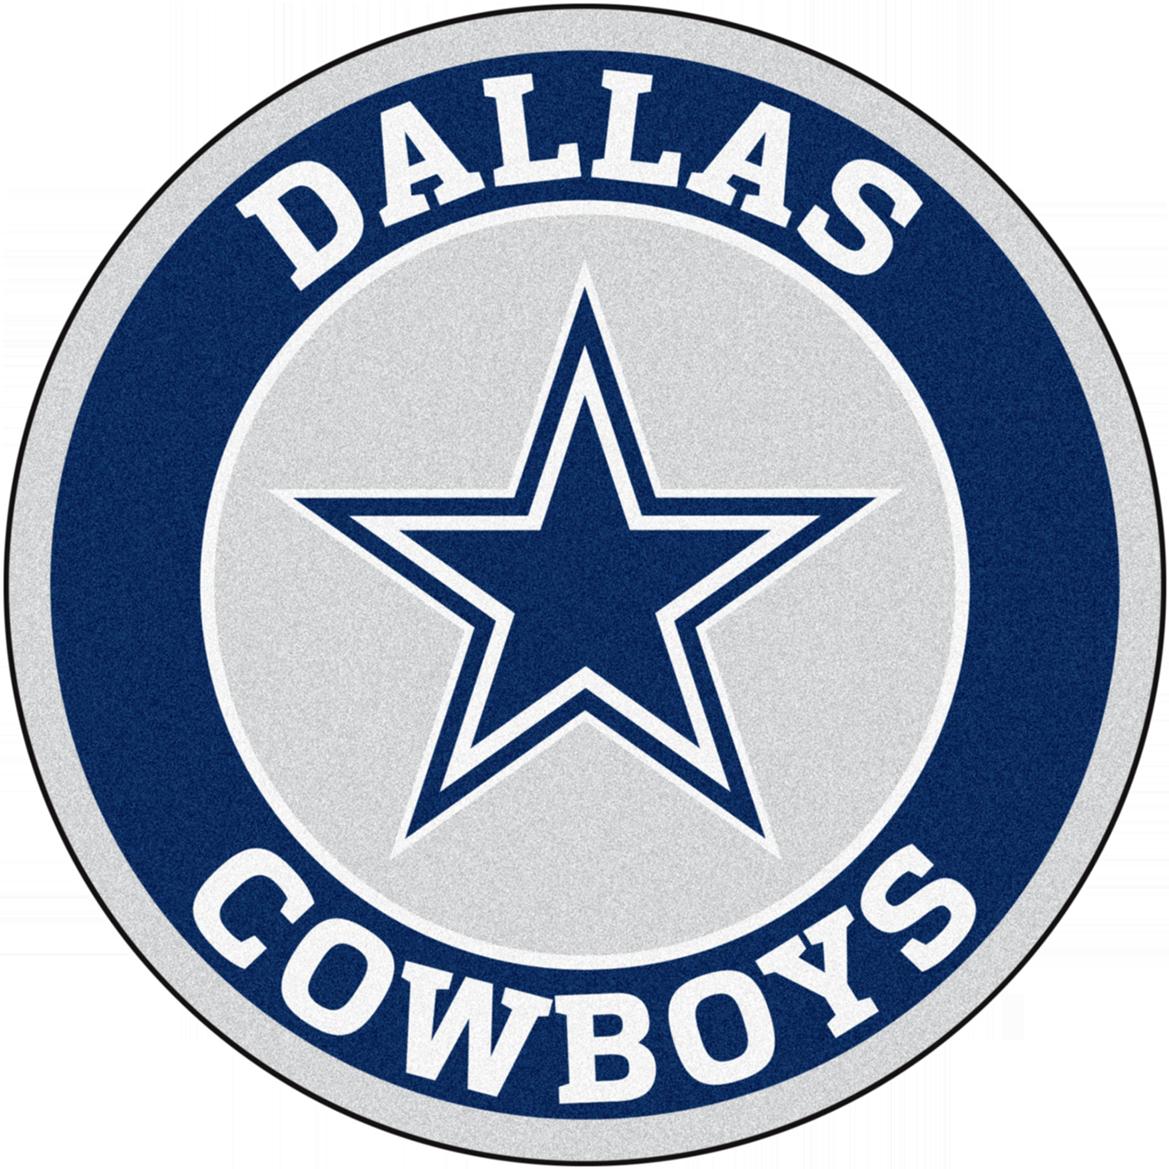 Dallas cowboys clipart high resolution. Logo wallpaper in black